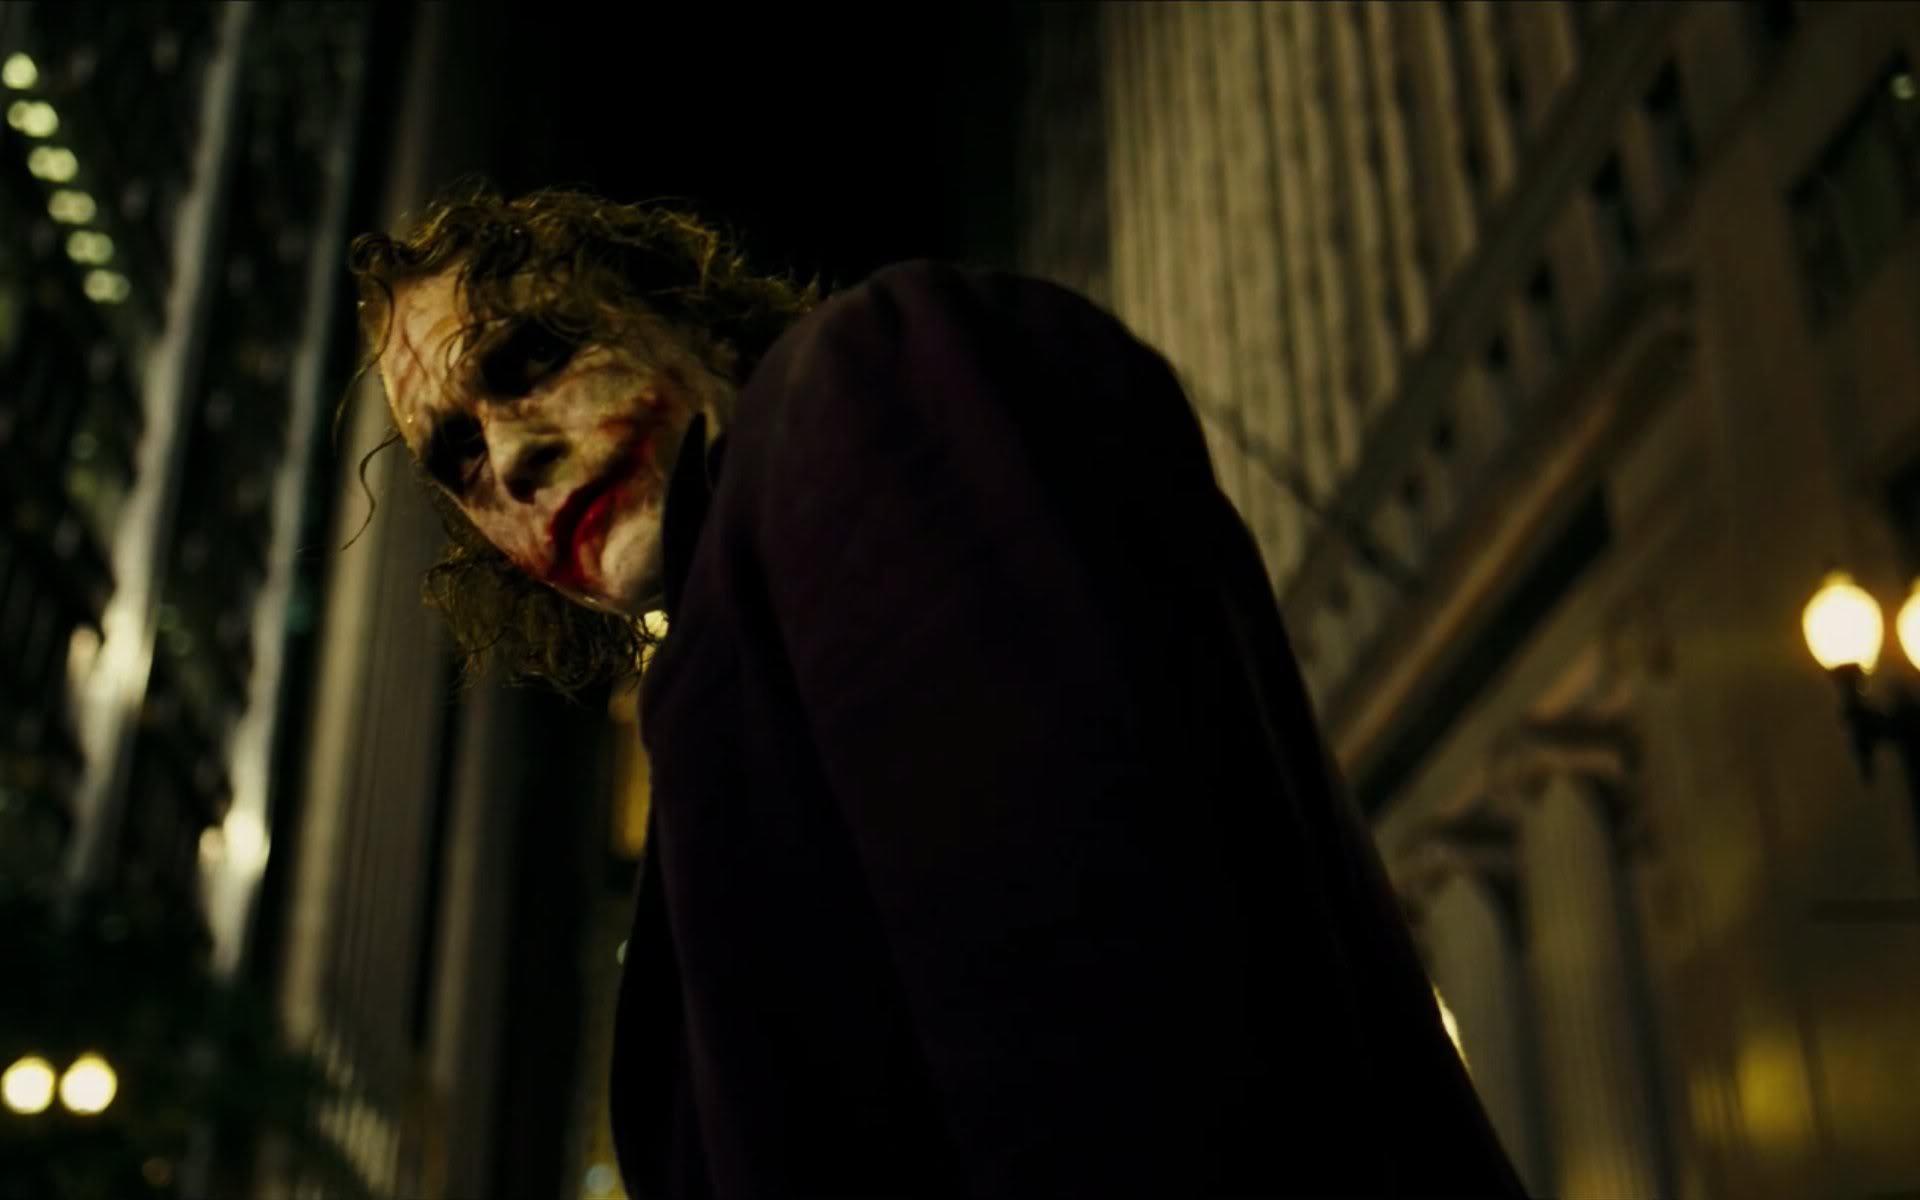 30193 download wallpaper Cinema, People, Actors, Men, Joker screensavers and pictures for free